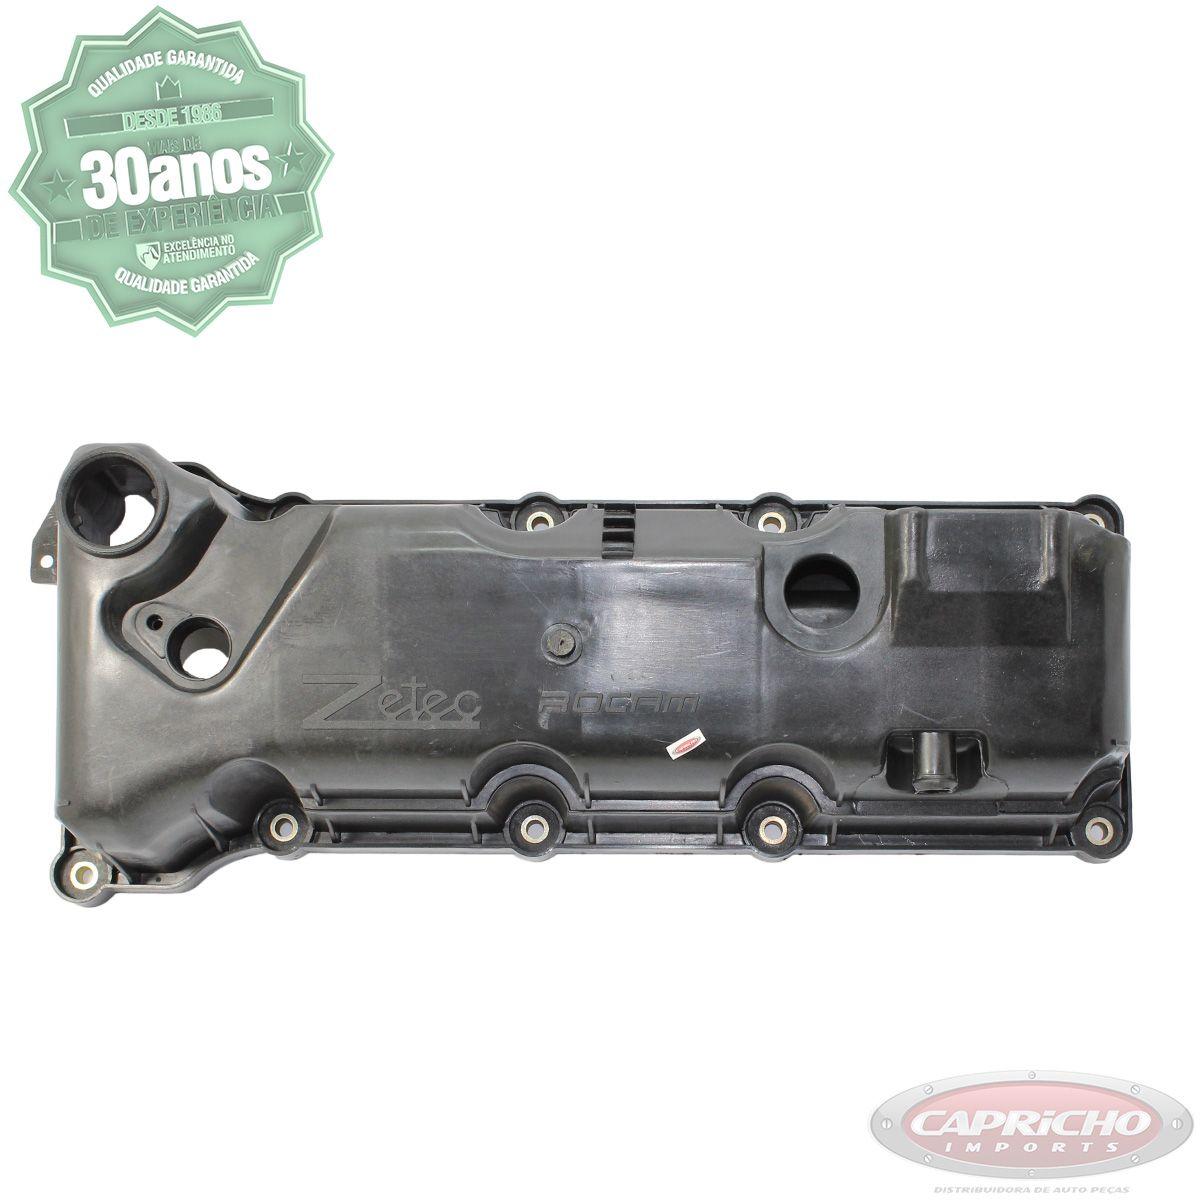 Tampa de válvulas + Junta - Ford Ka / Fiesta - Motor Zetec Rocam 1.0 / 1.6 Flex